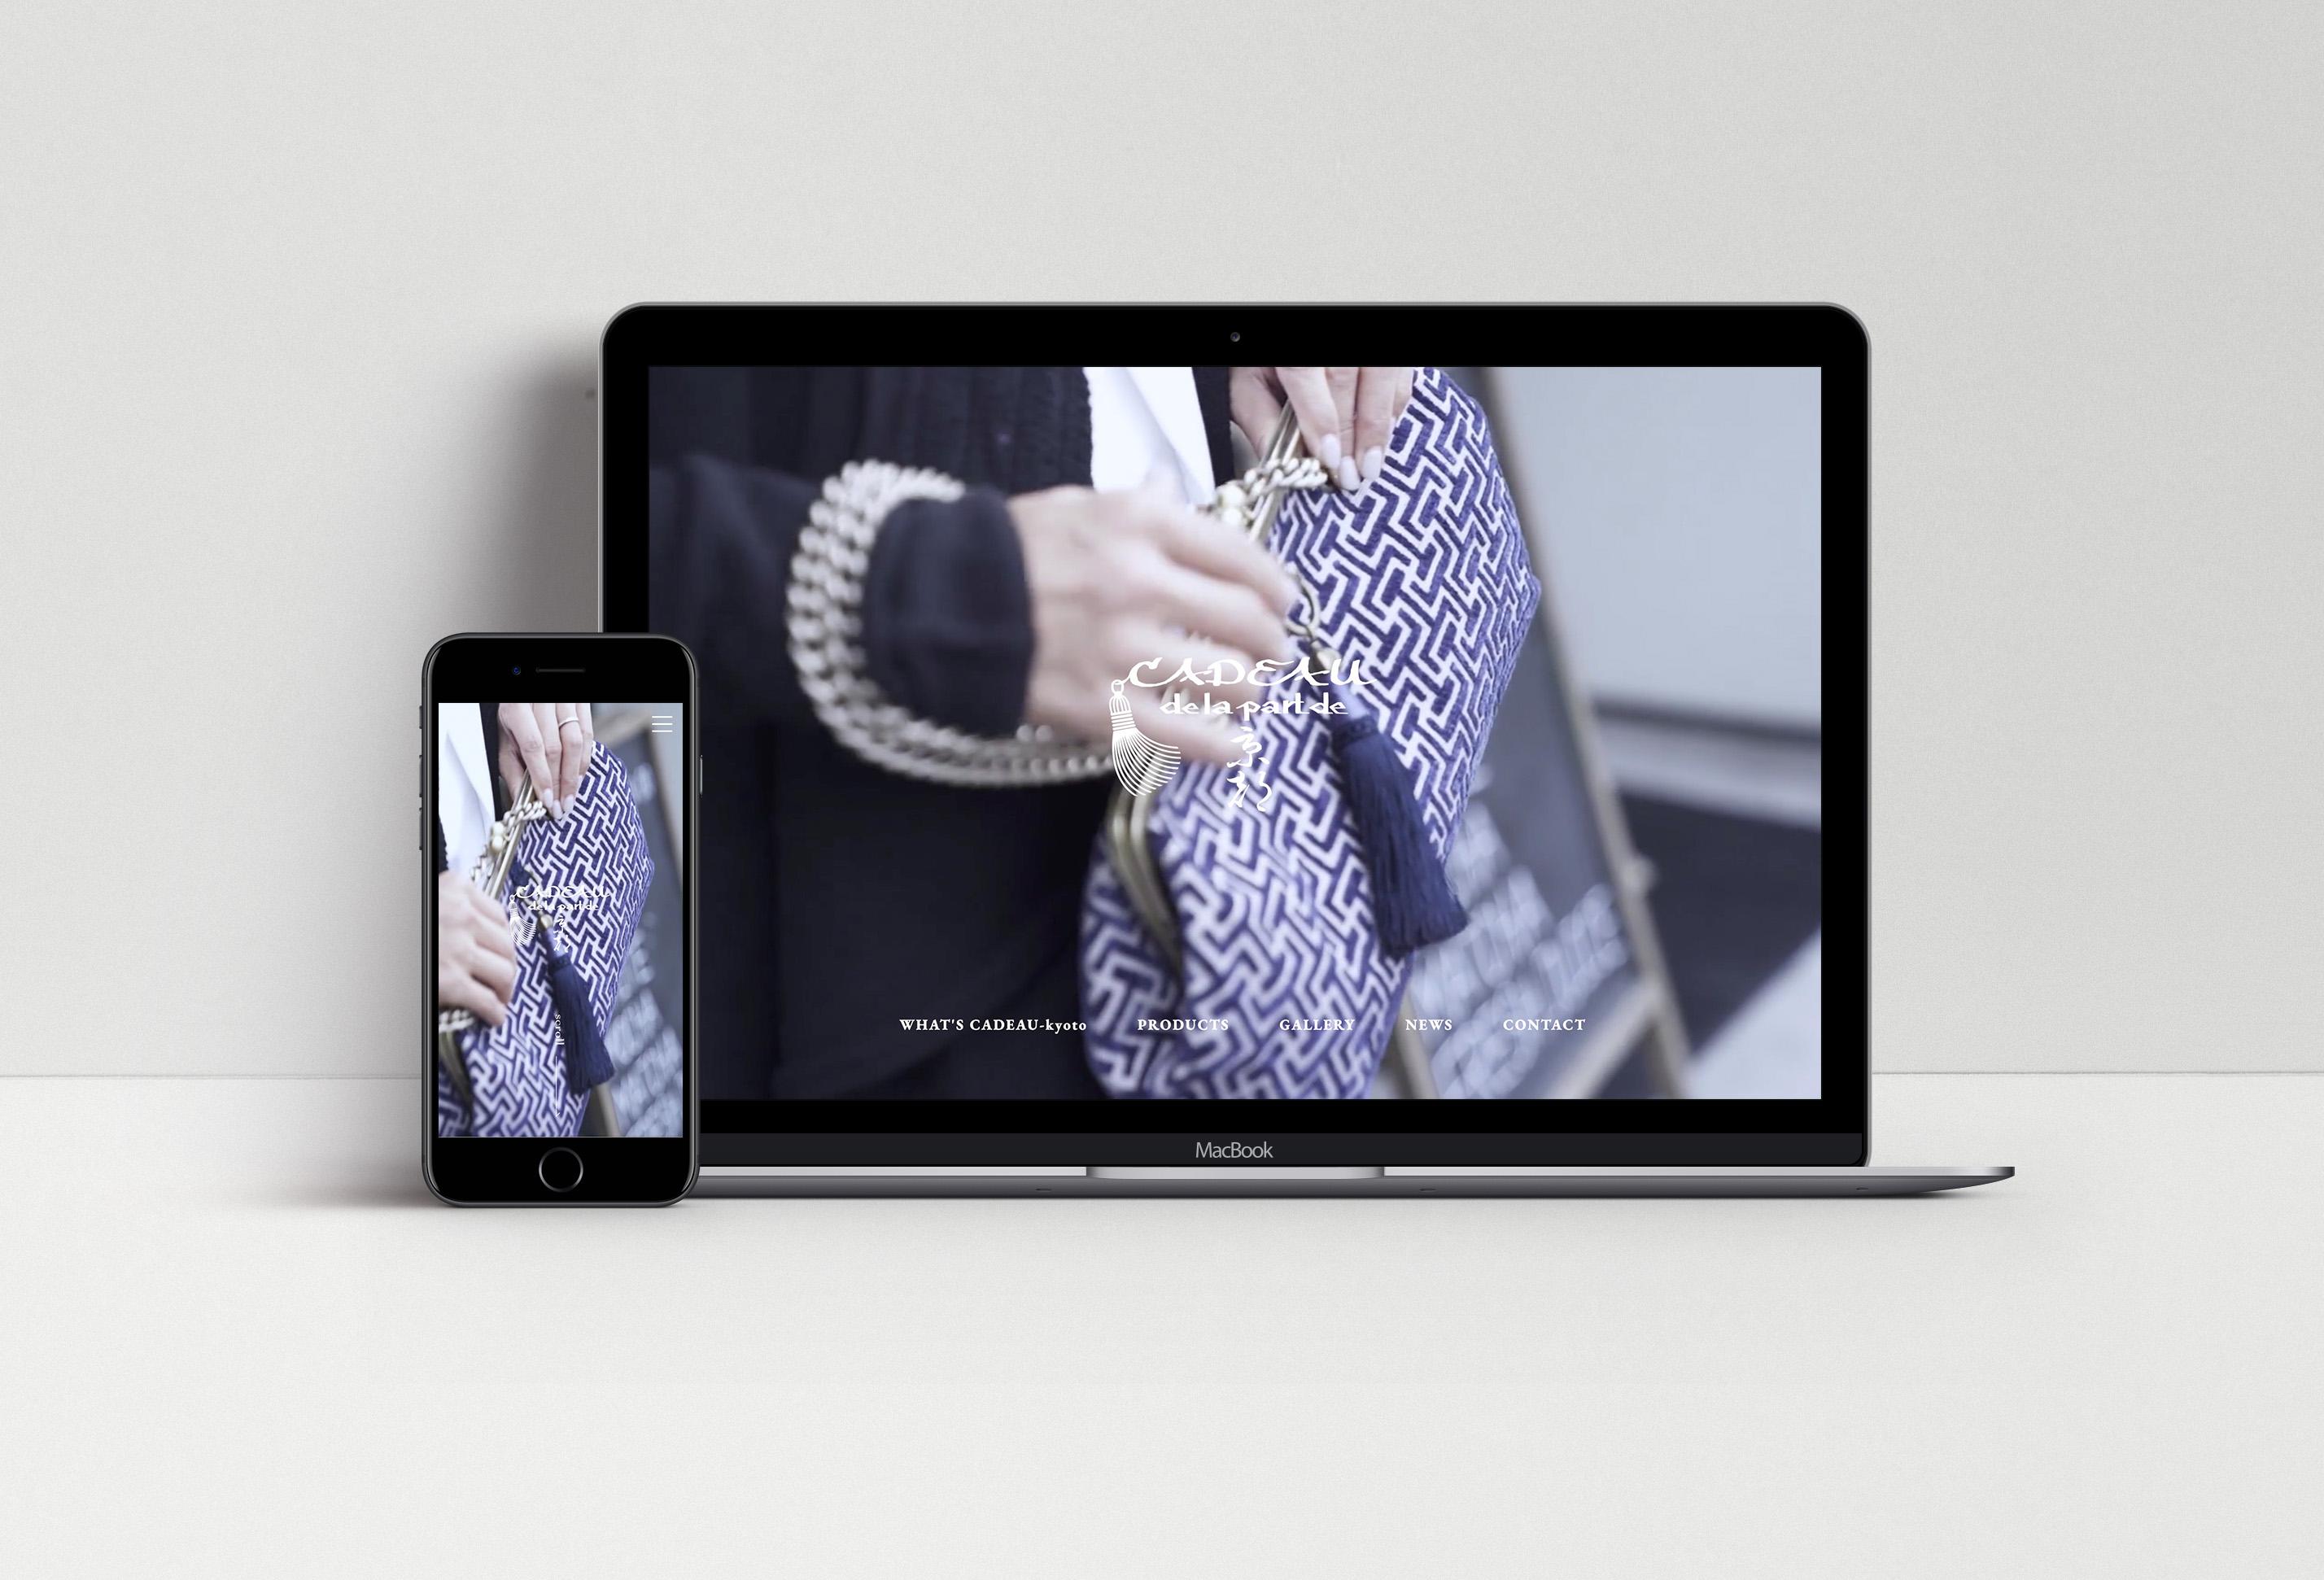 web-showcase-project-presentationjpg